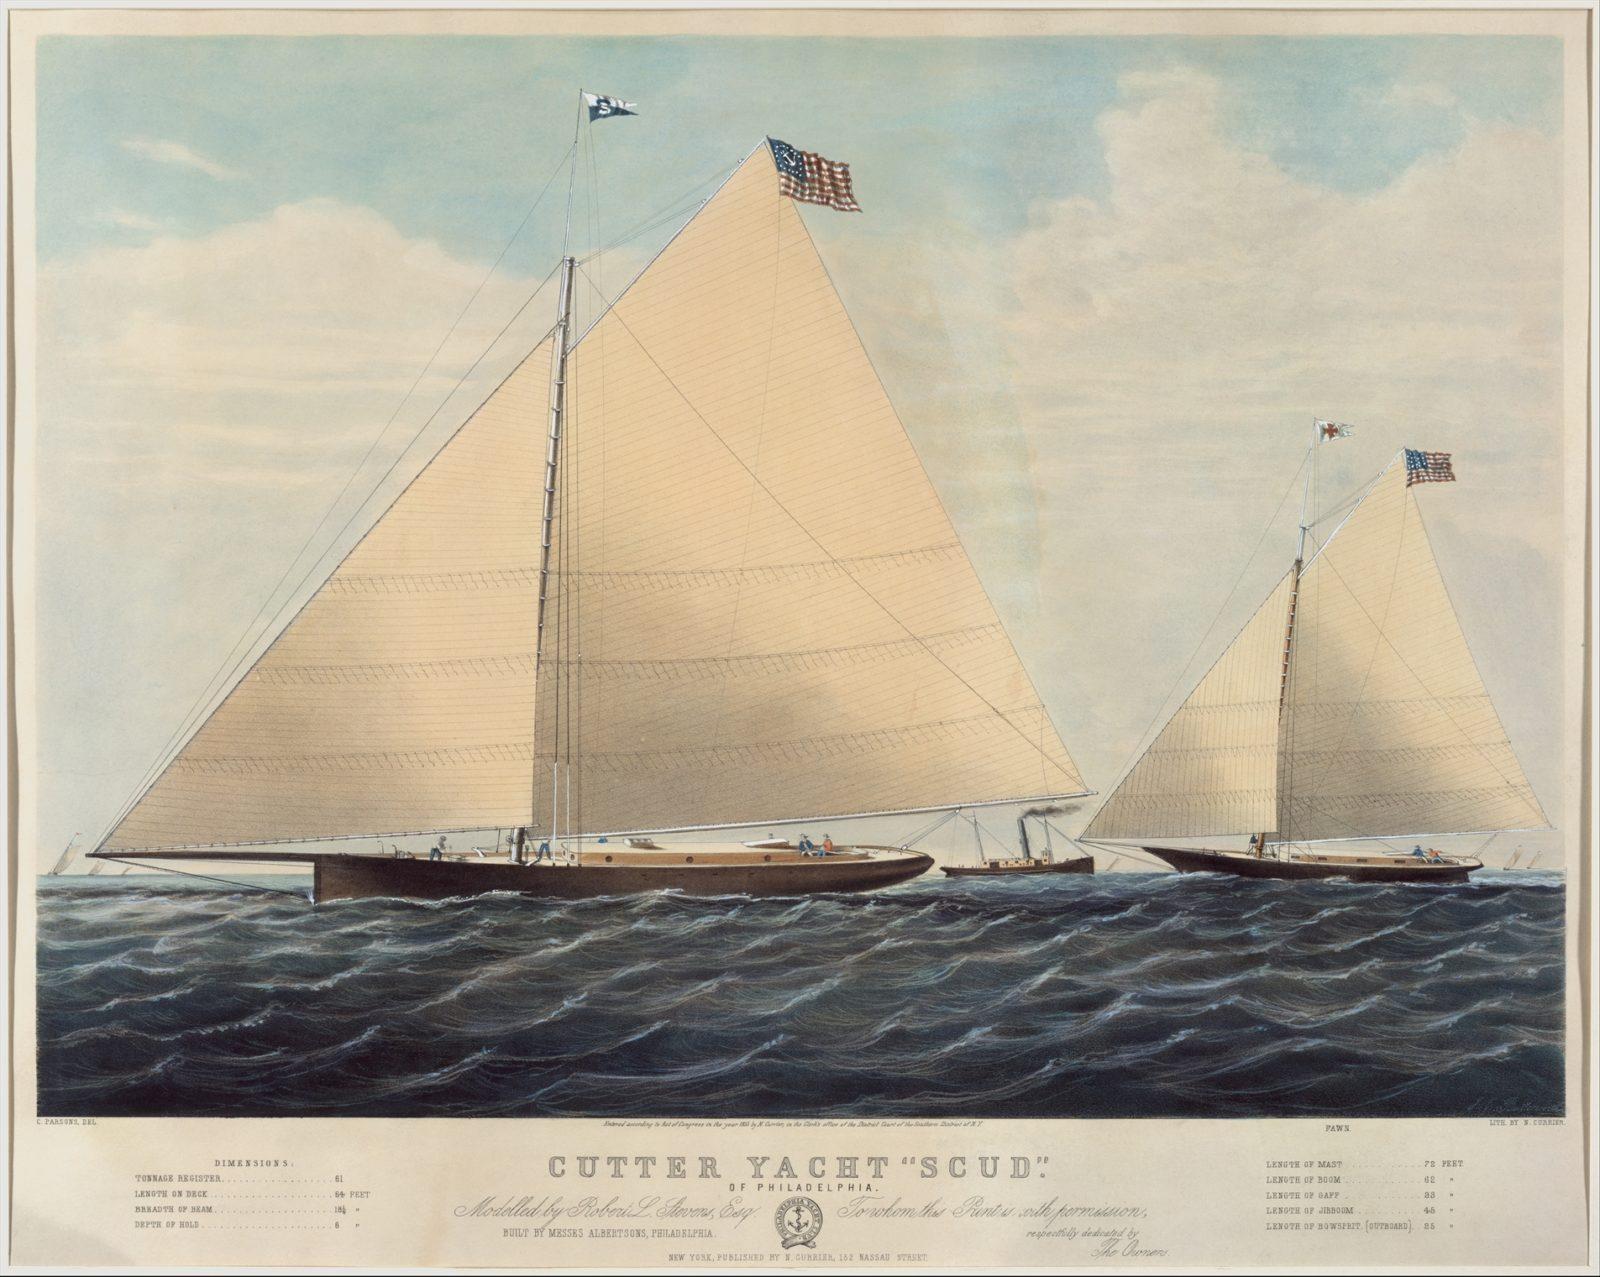 "Cutter Yacht ""Scud"" of Philadelphia – Modelled by Robert L. Stevens, Esq."